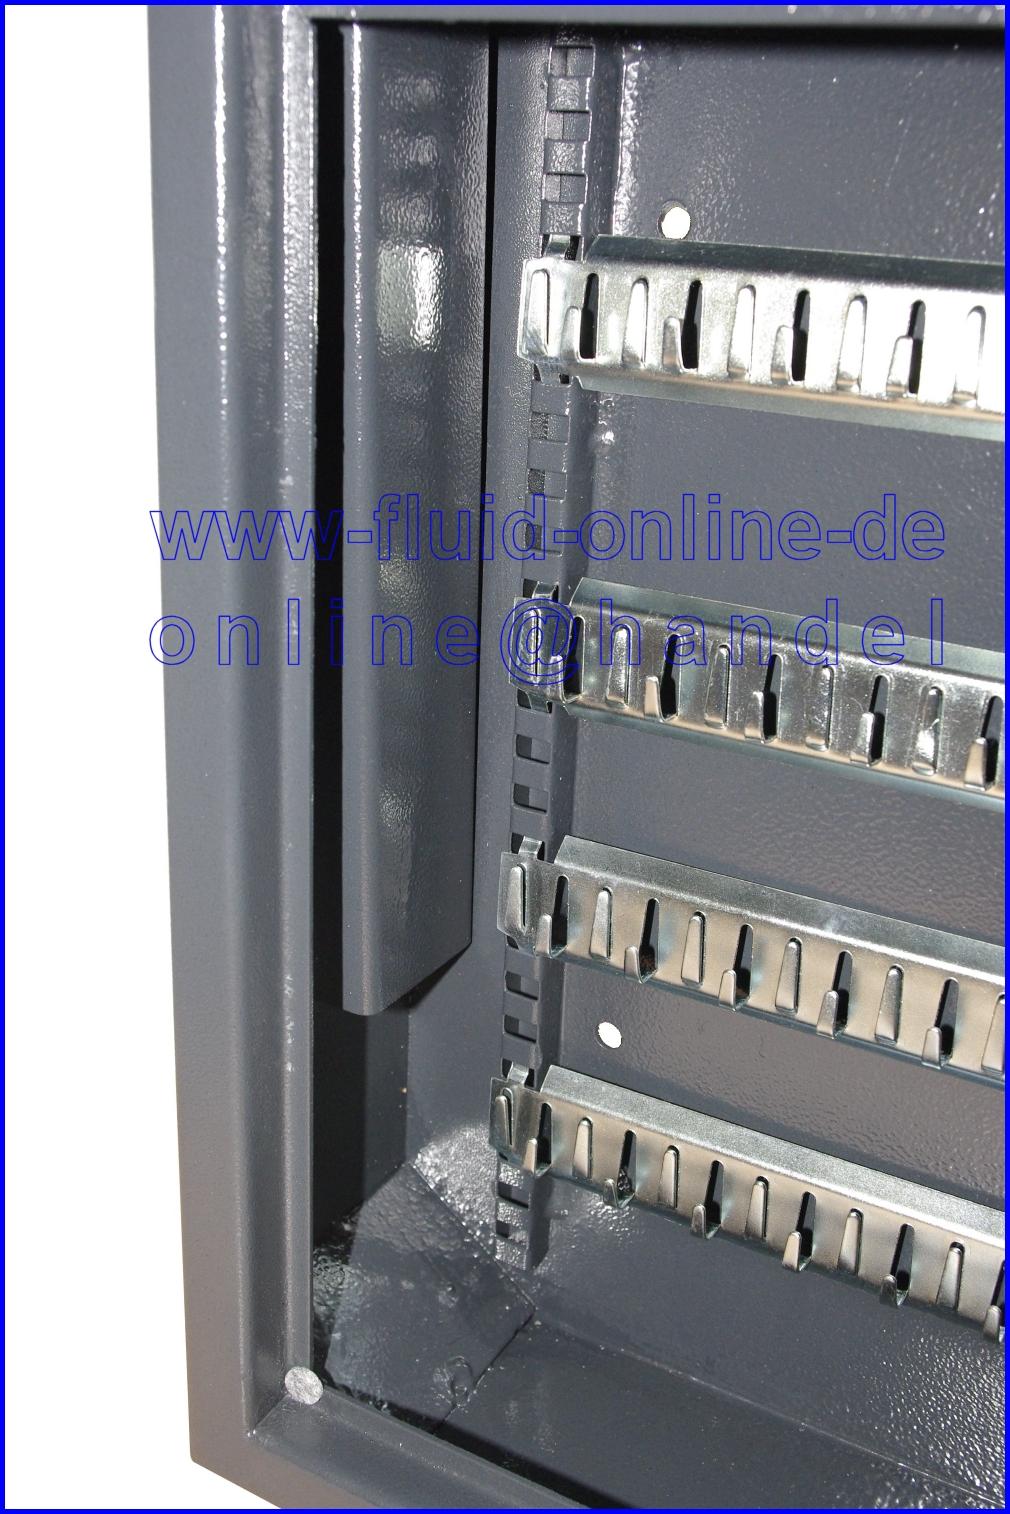 schl sseltresor safe tresor kc48el max 48 schl ssel elektronisches zahlenschlo. Black Bedroom Furniture Sets. Home Design Ideas